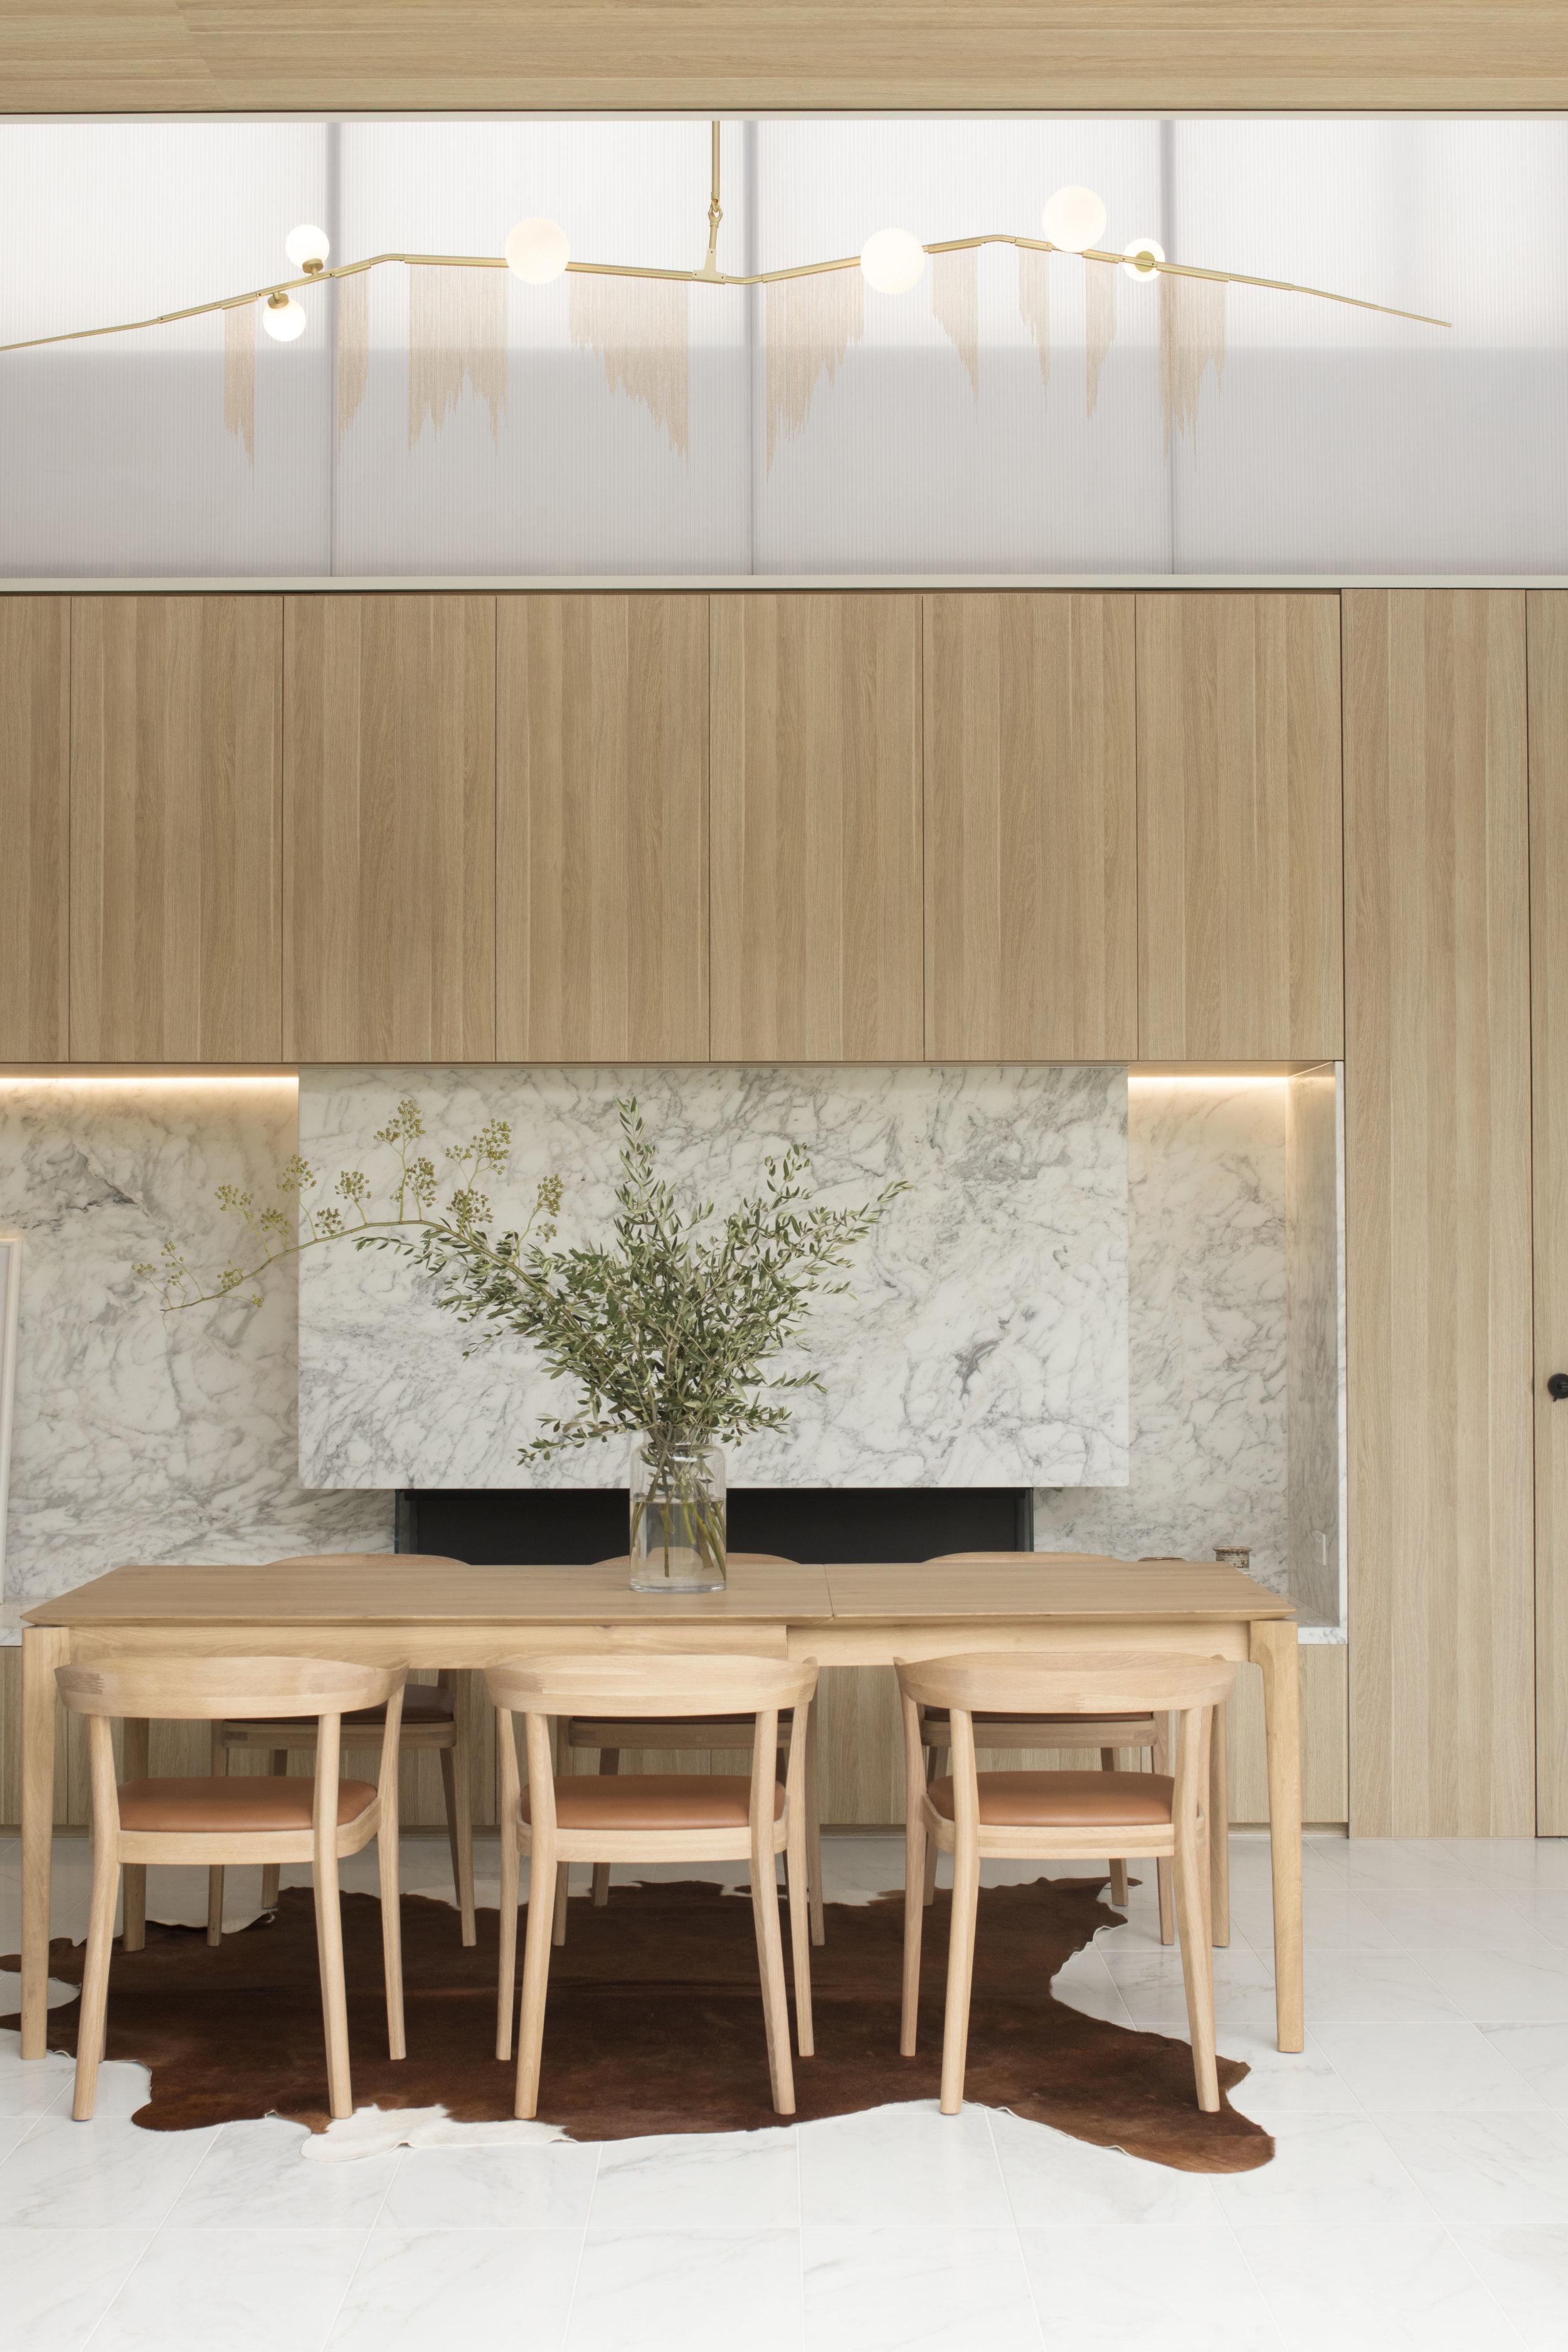 Pitch_Architecture_Lantern House_9